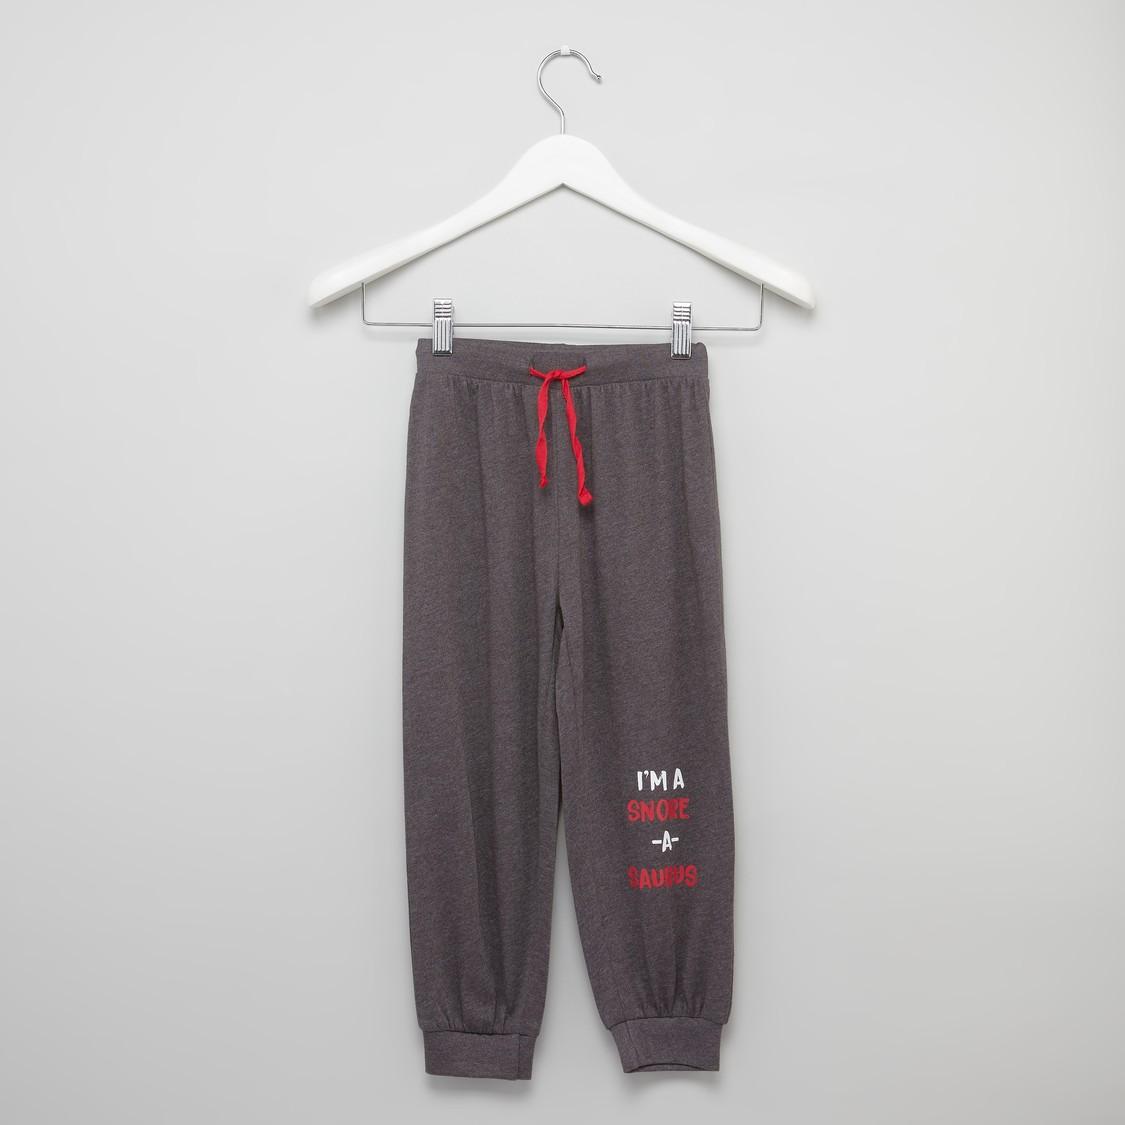 Printed Raglan Sleeves T-shirt with Full Length Jog Pants